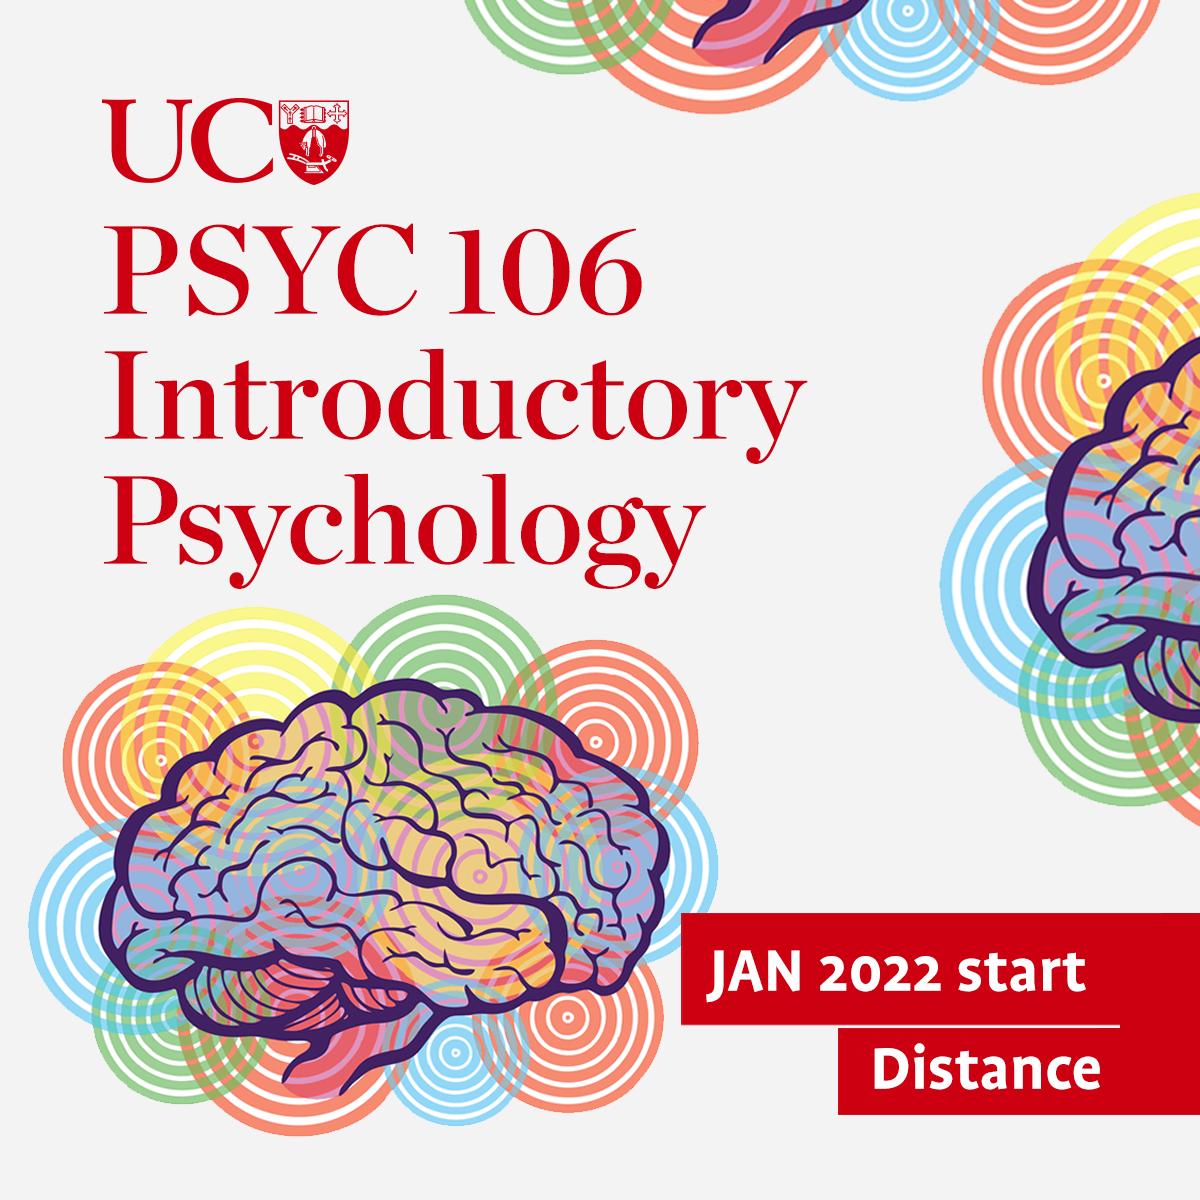 Psyc 106